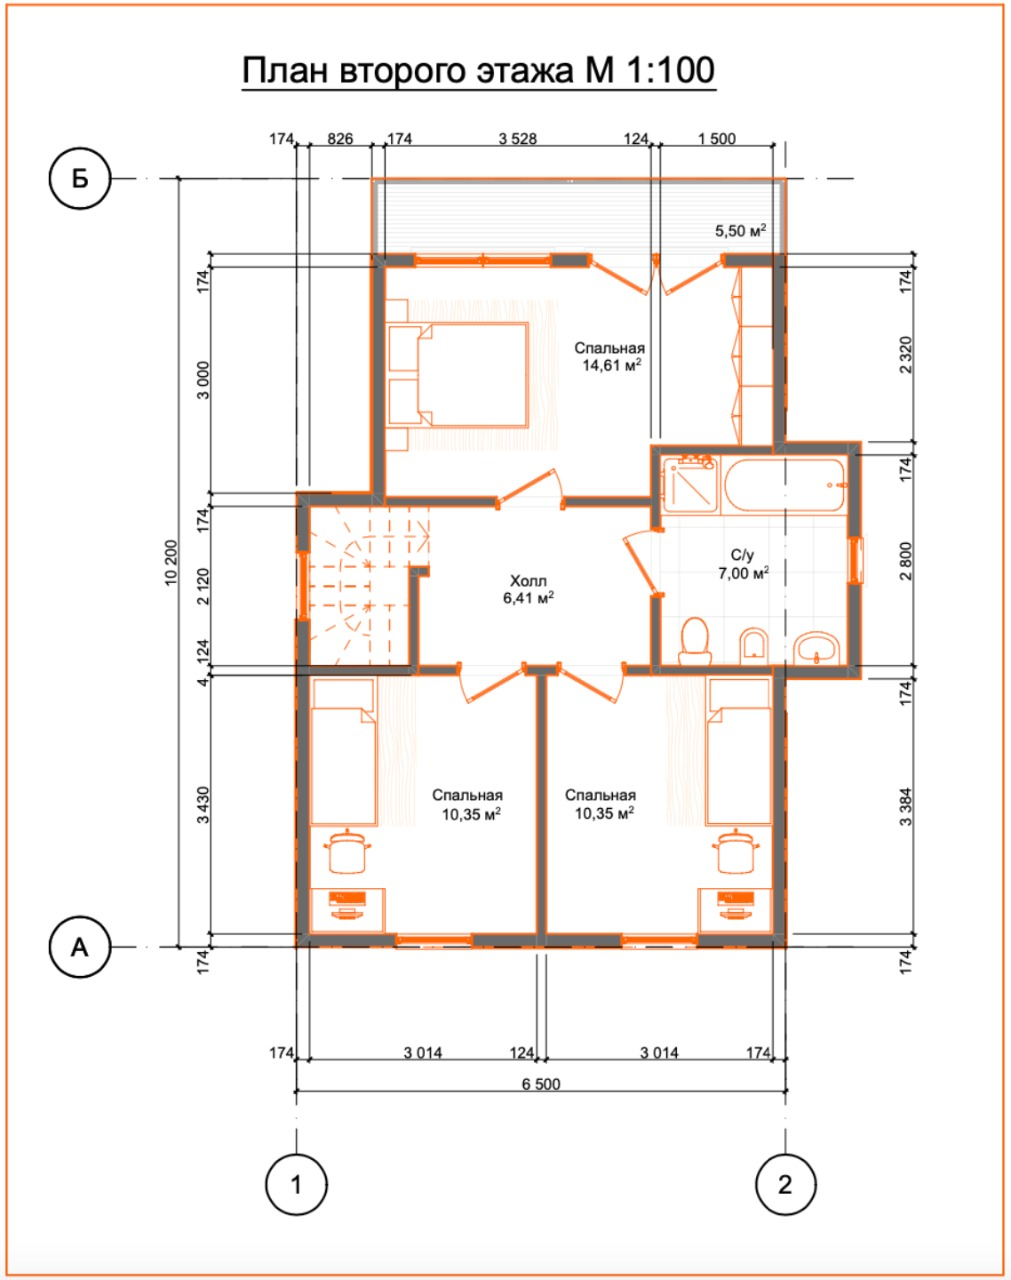 План второго этажа по проекту Гираторий